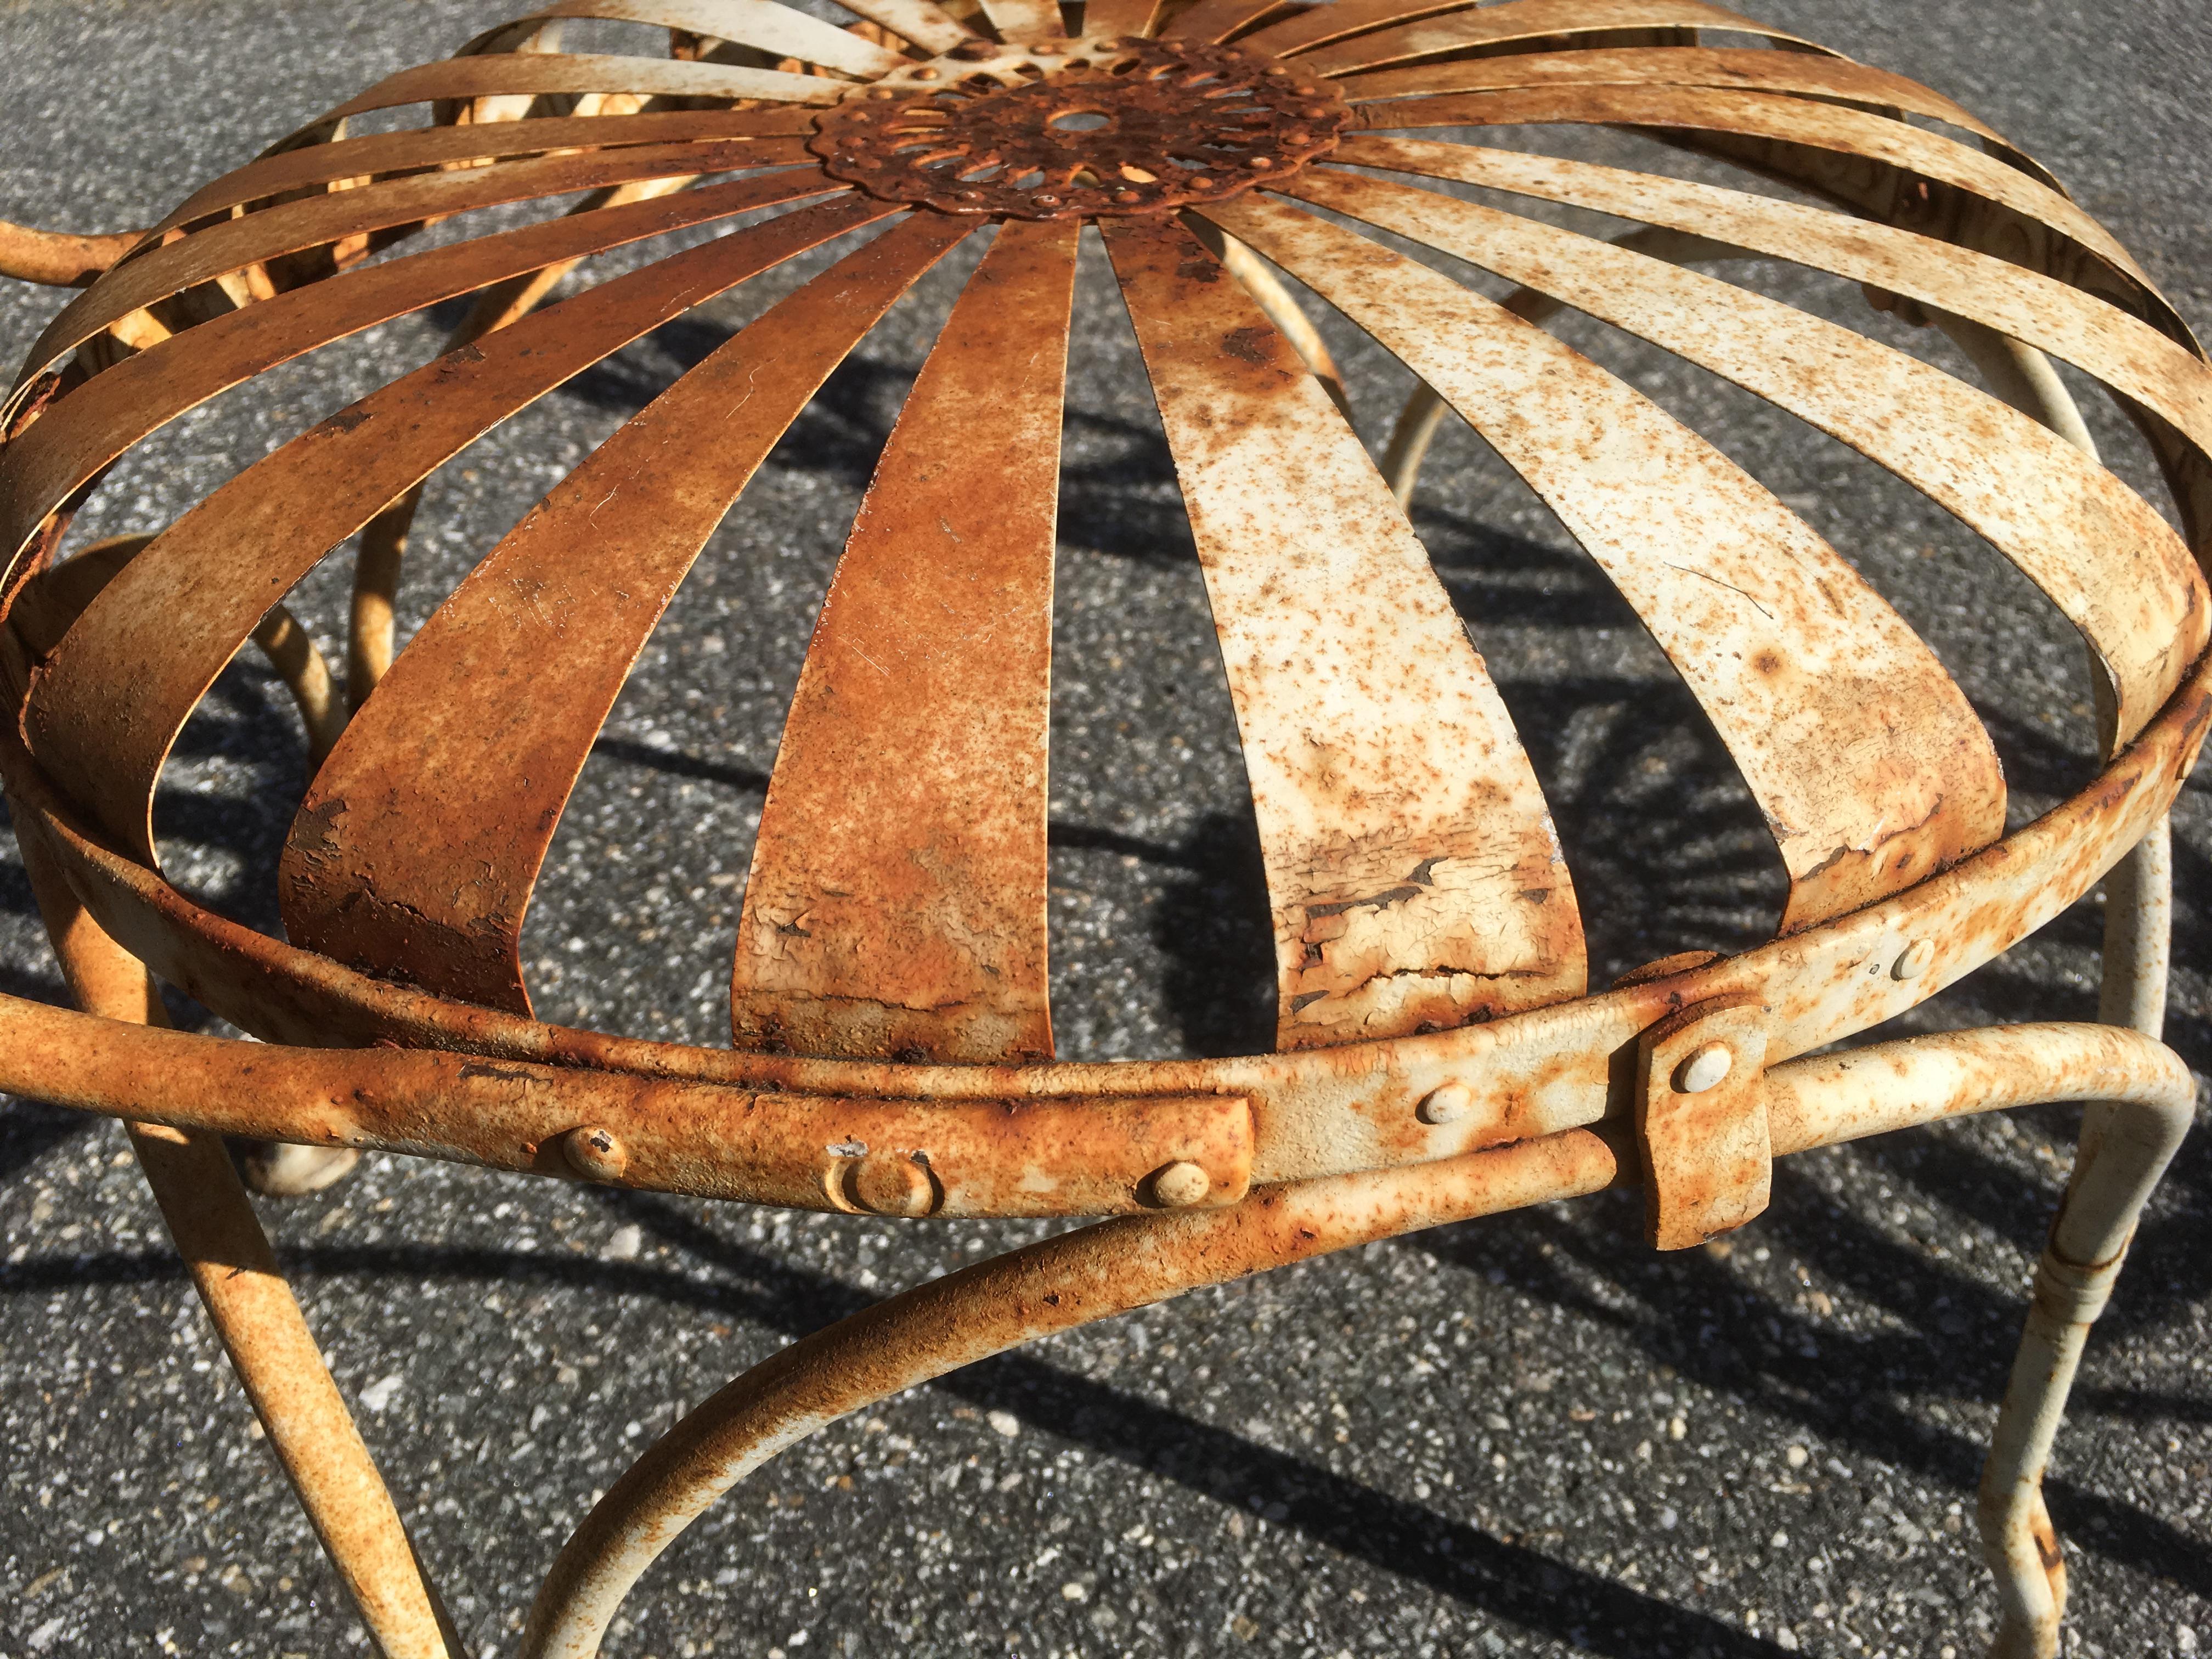 deco garden furniture. 1930\u0027s French Art Deco Francois Carre Sunburst Iron Chairs \u0026 Patio Table  For Sale - Image Deco Garden Furniture